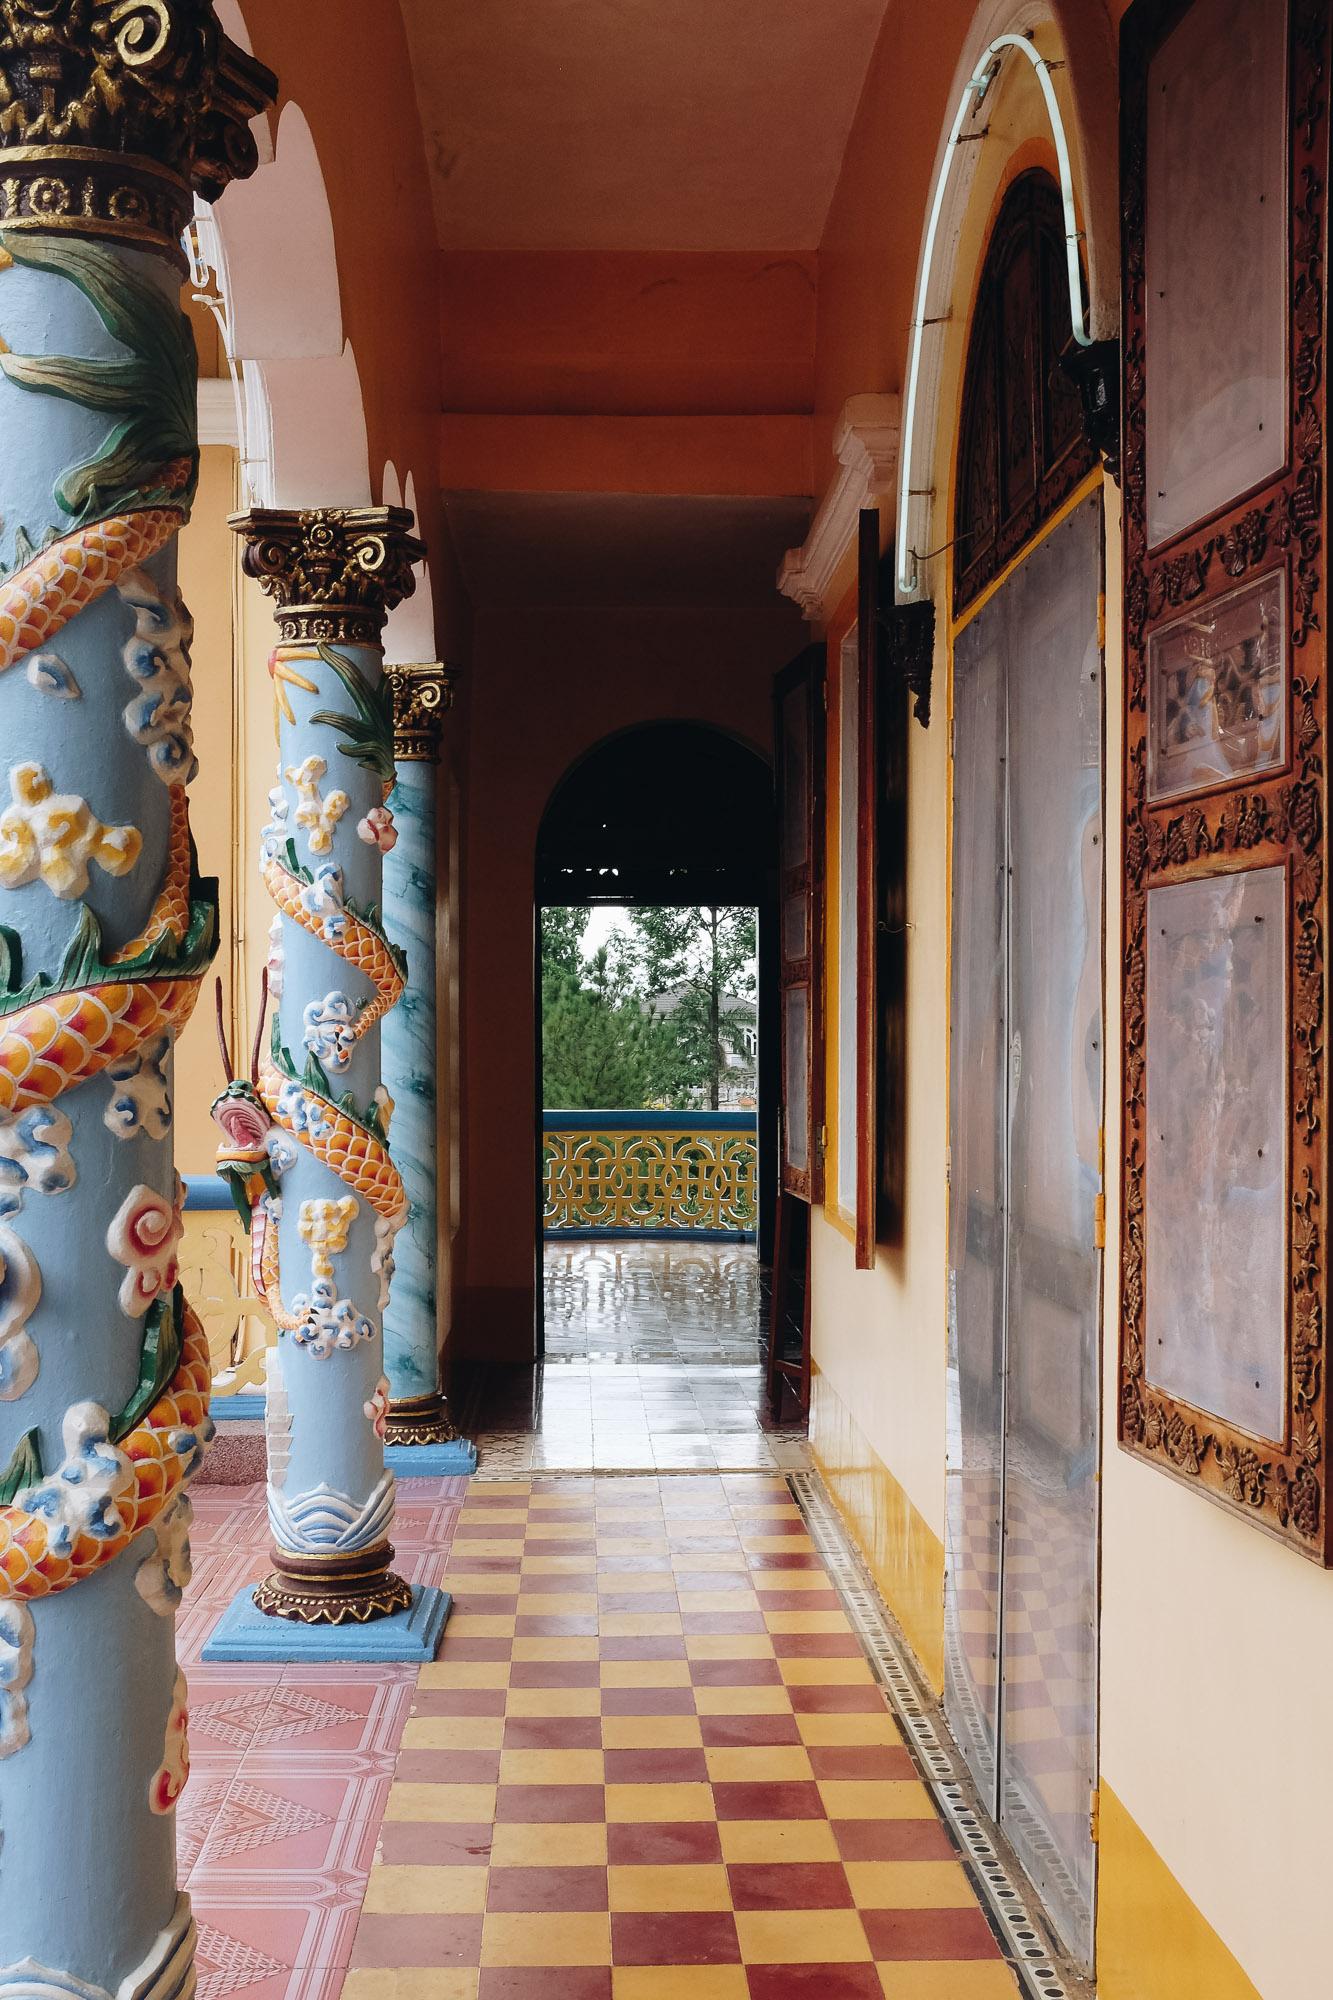 OTH_4509_2017, Cao Dai Holy See, Vietnam.jpg